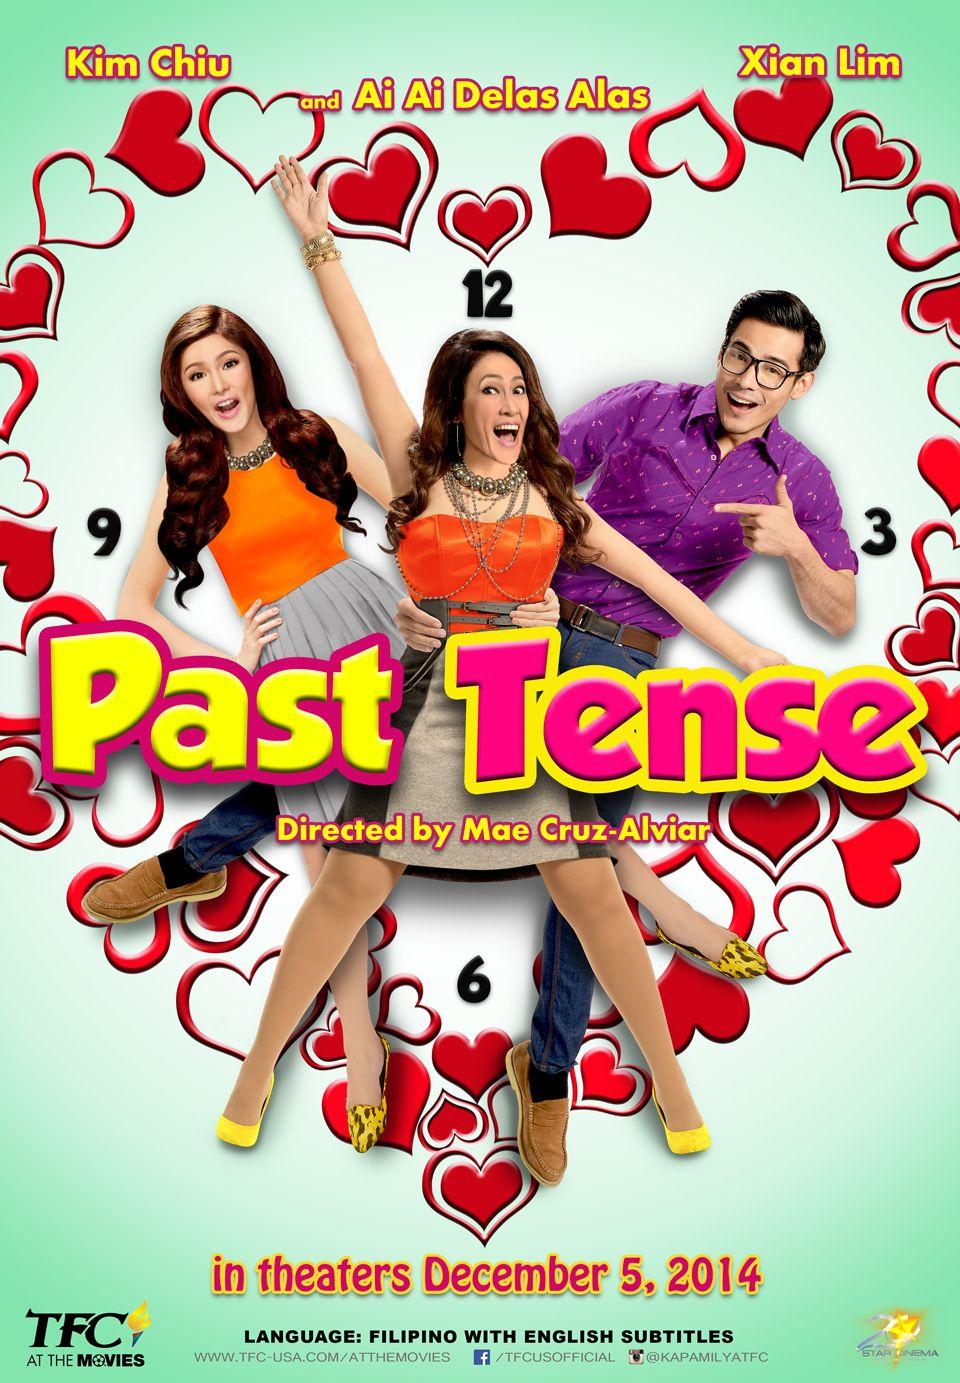 Kuwaresma 2019 hd full pinoy movies cine pinoy movies